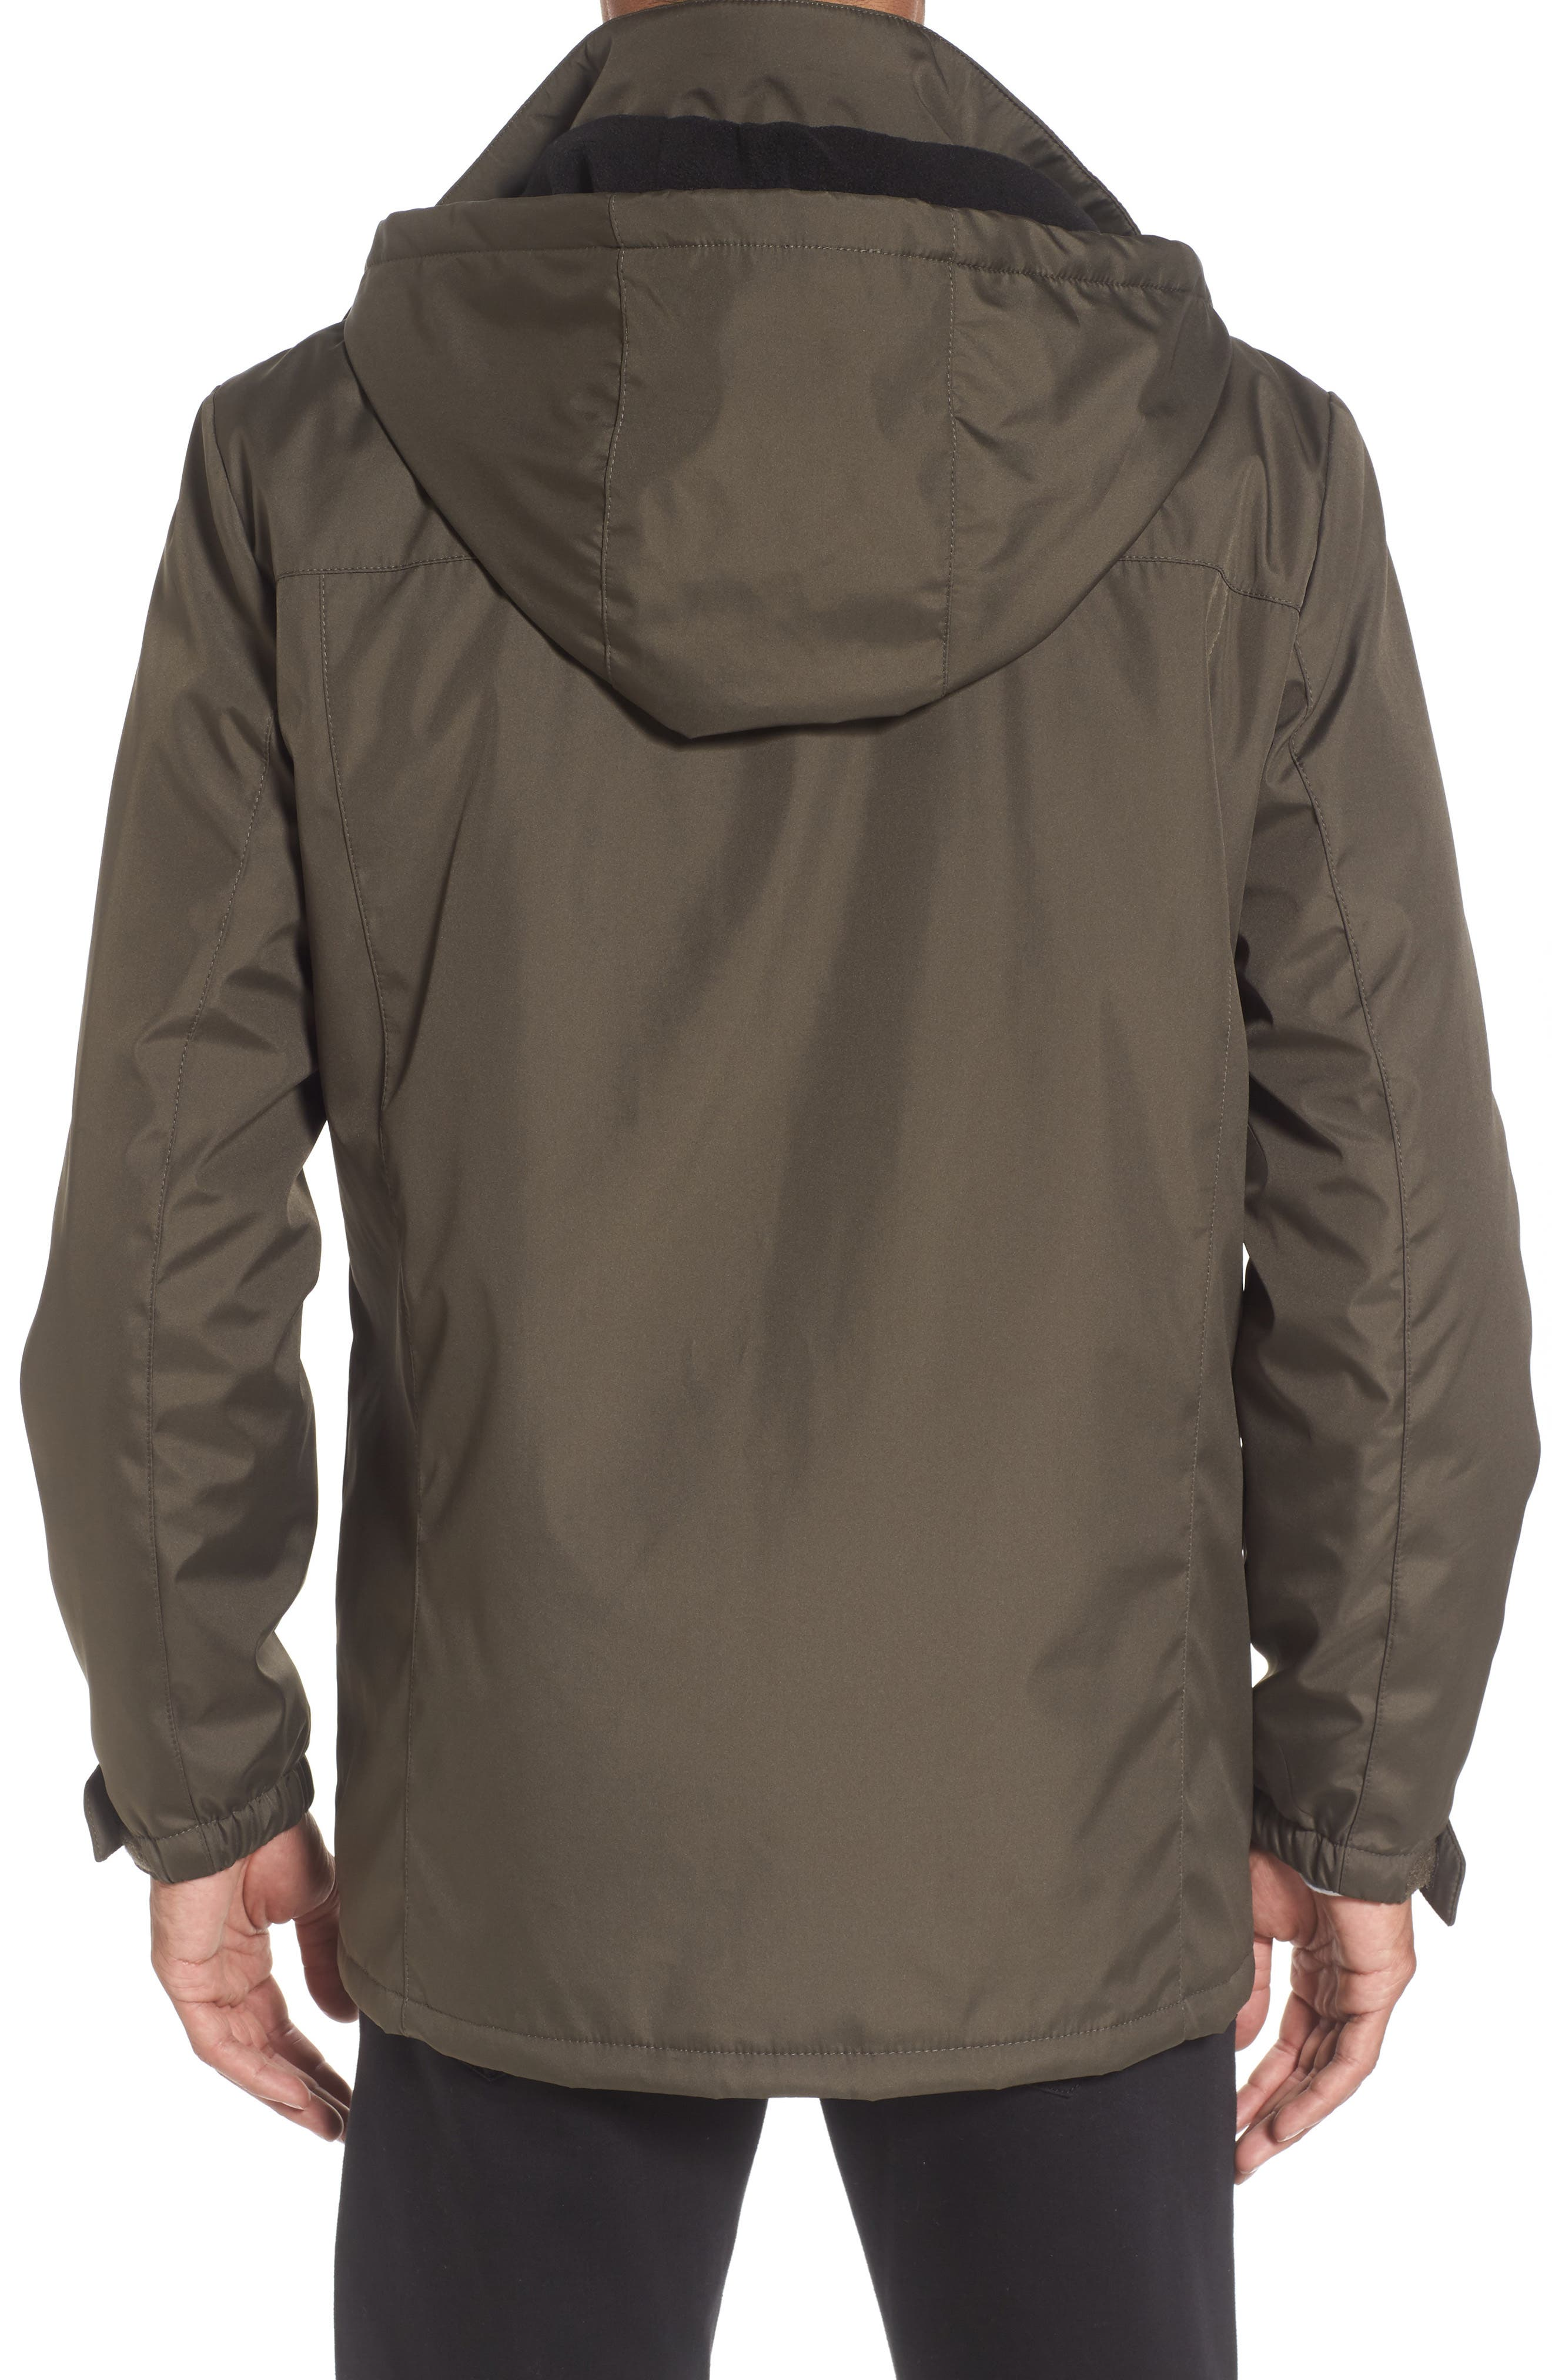 Hooded Jacket with Inset Fleece Bib,                             Alternate thumbnail 7, color,